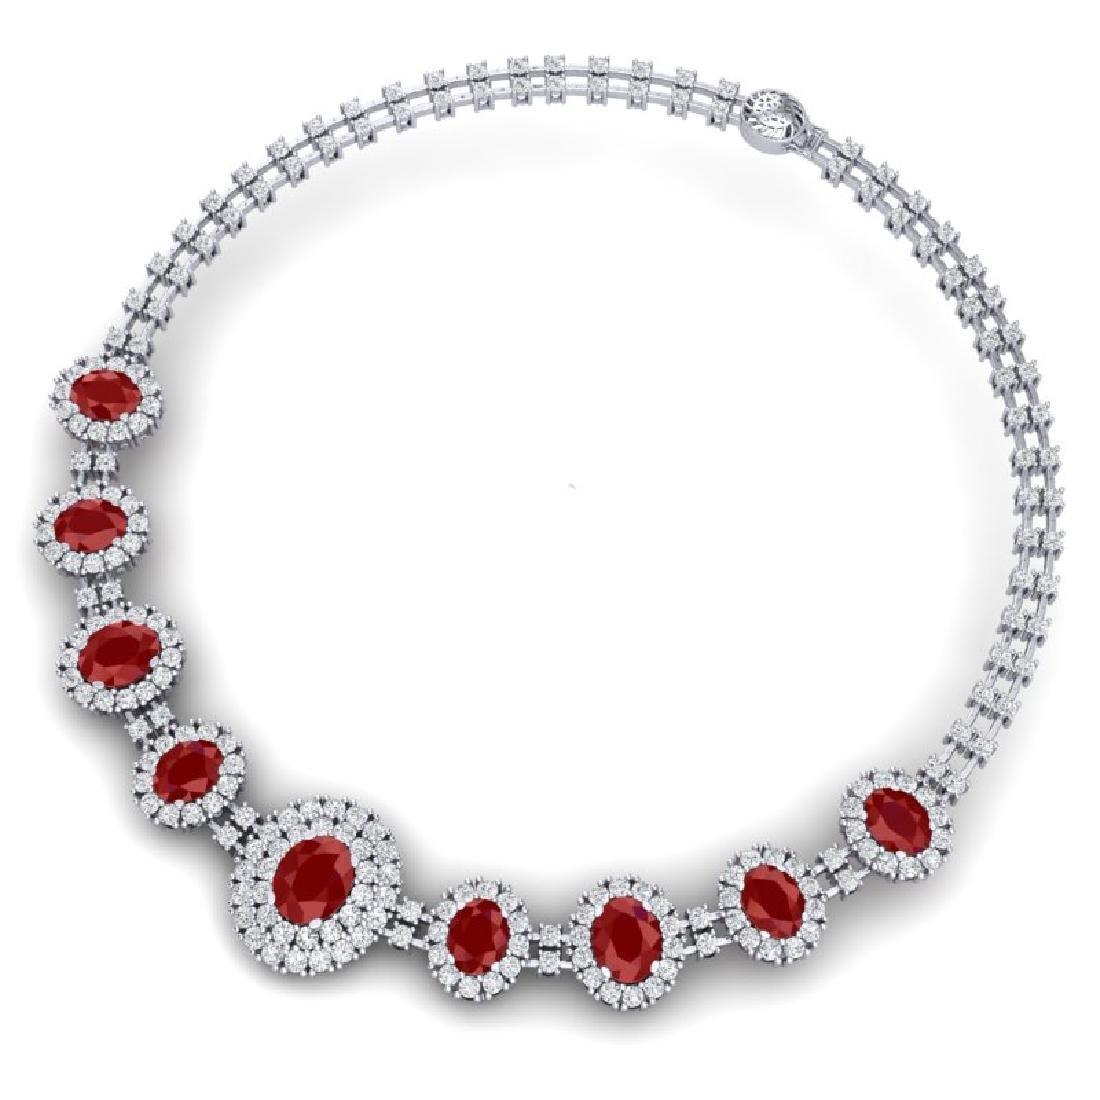 45.69 CTW Royalty Ruby & VS Diamond Necklace 18K White - 2